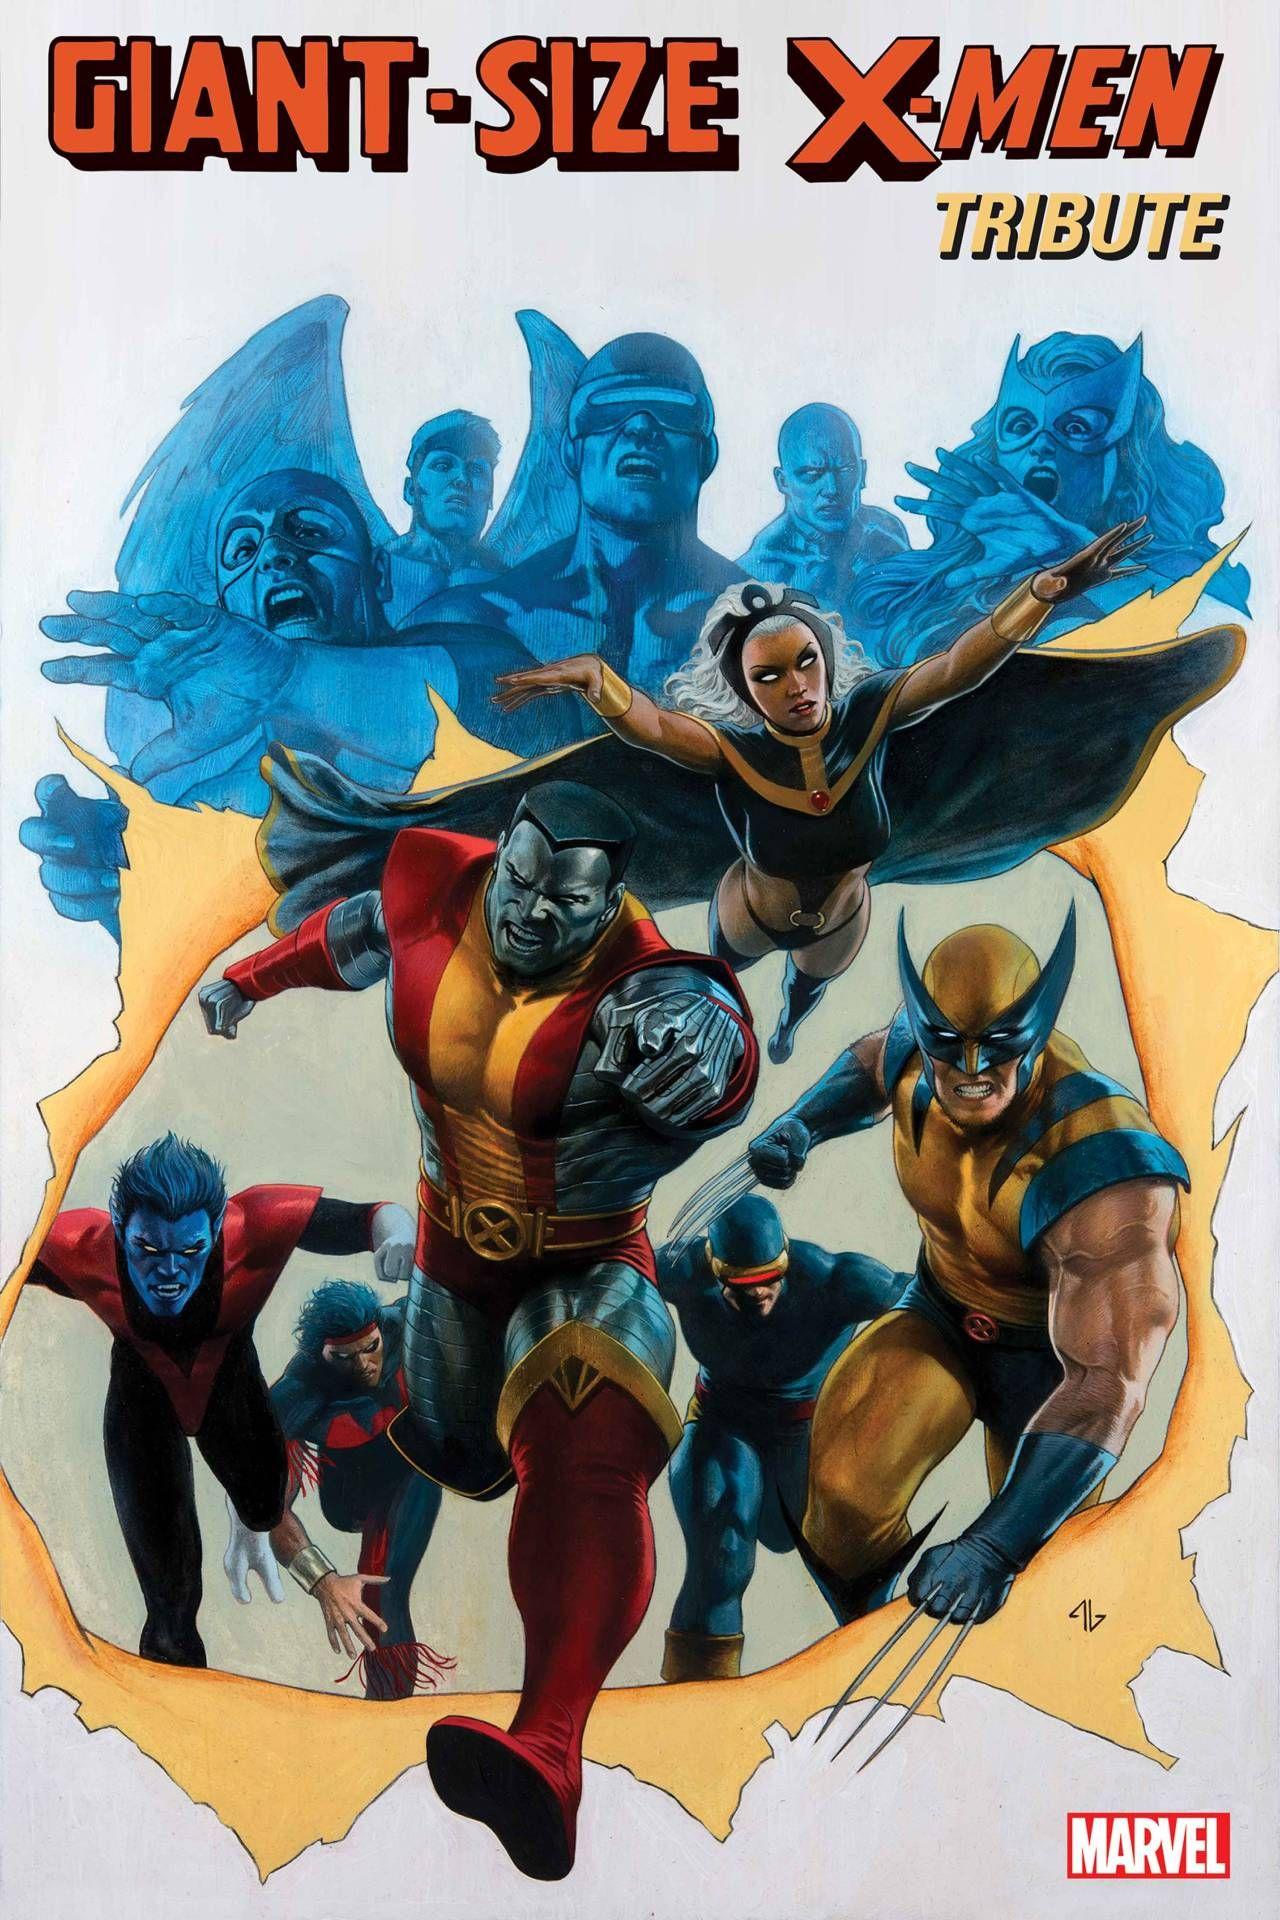 Giant Size X Men 45th Anniversary Special Tribute Cover By Adi Granov In 2020 Marvel Comic Books X Men Comics